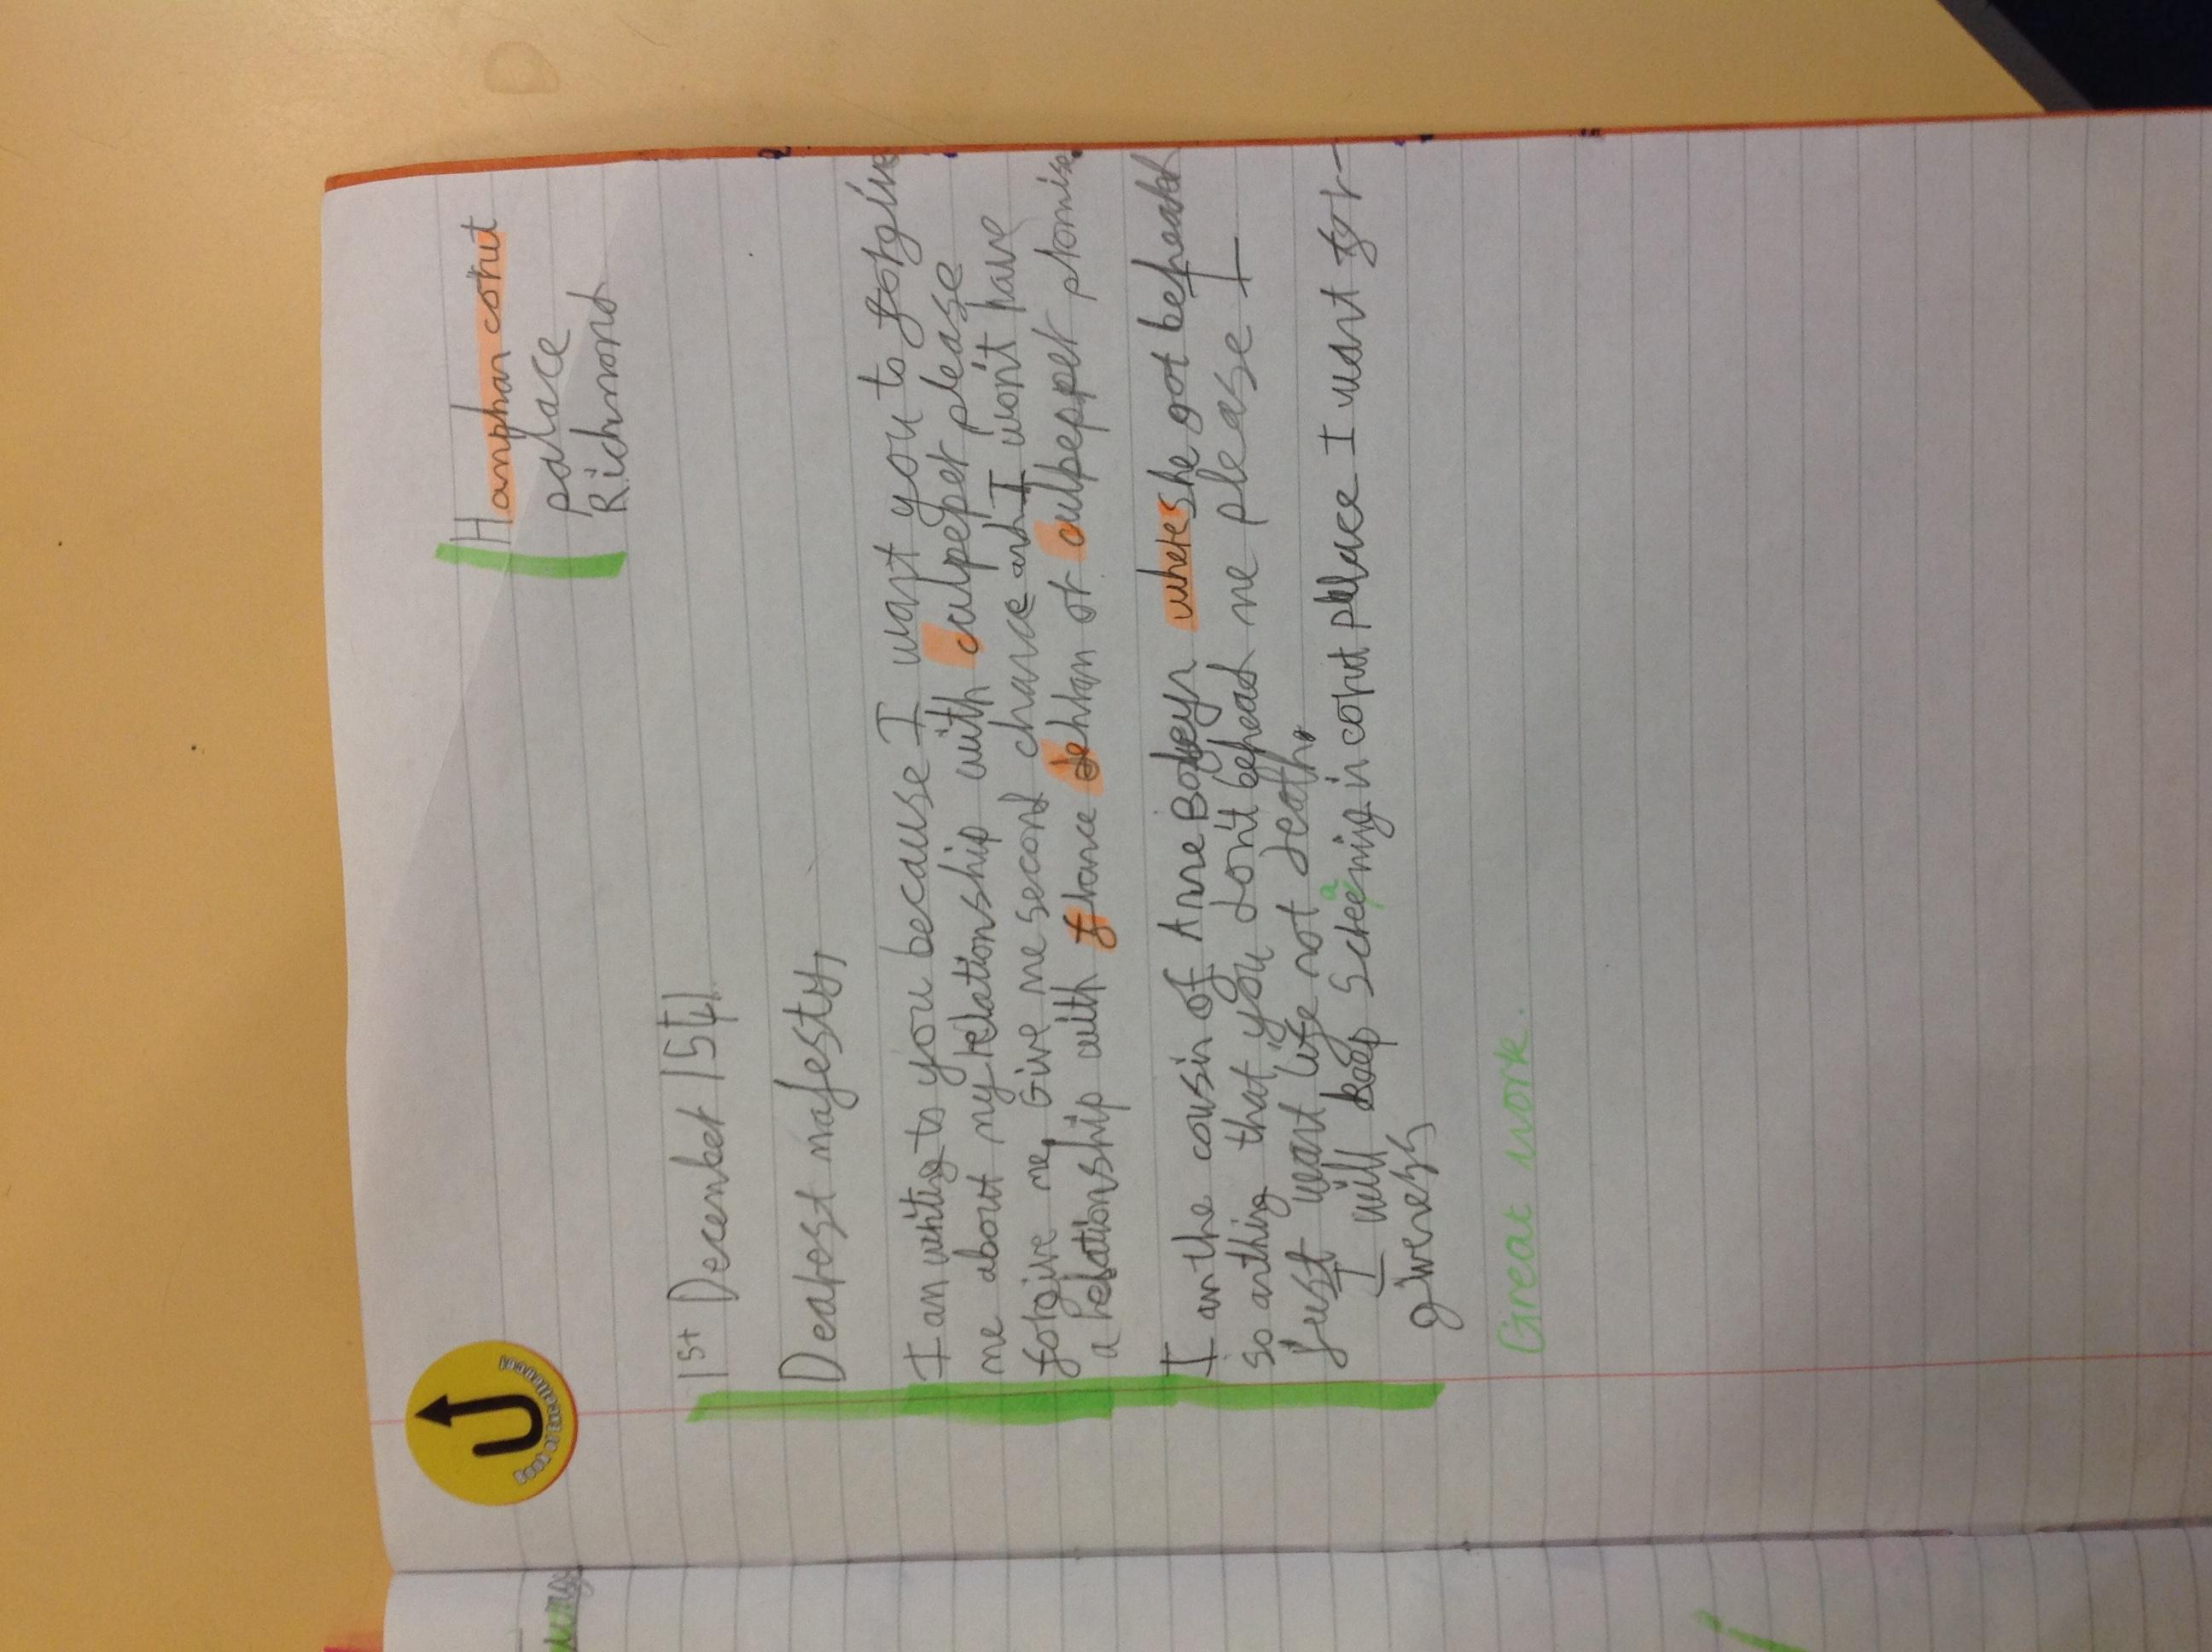 Sani's wonderful writing!